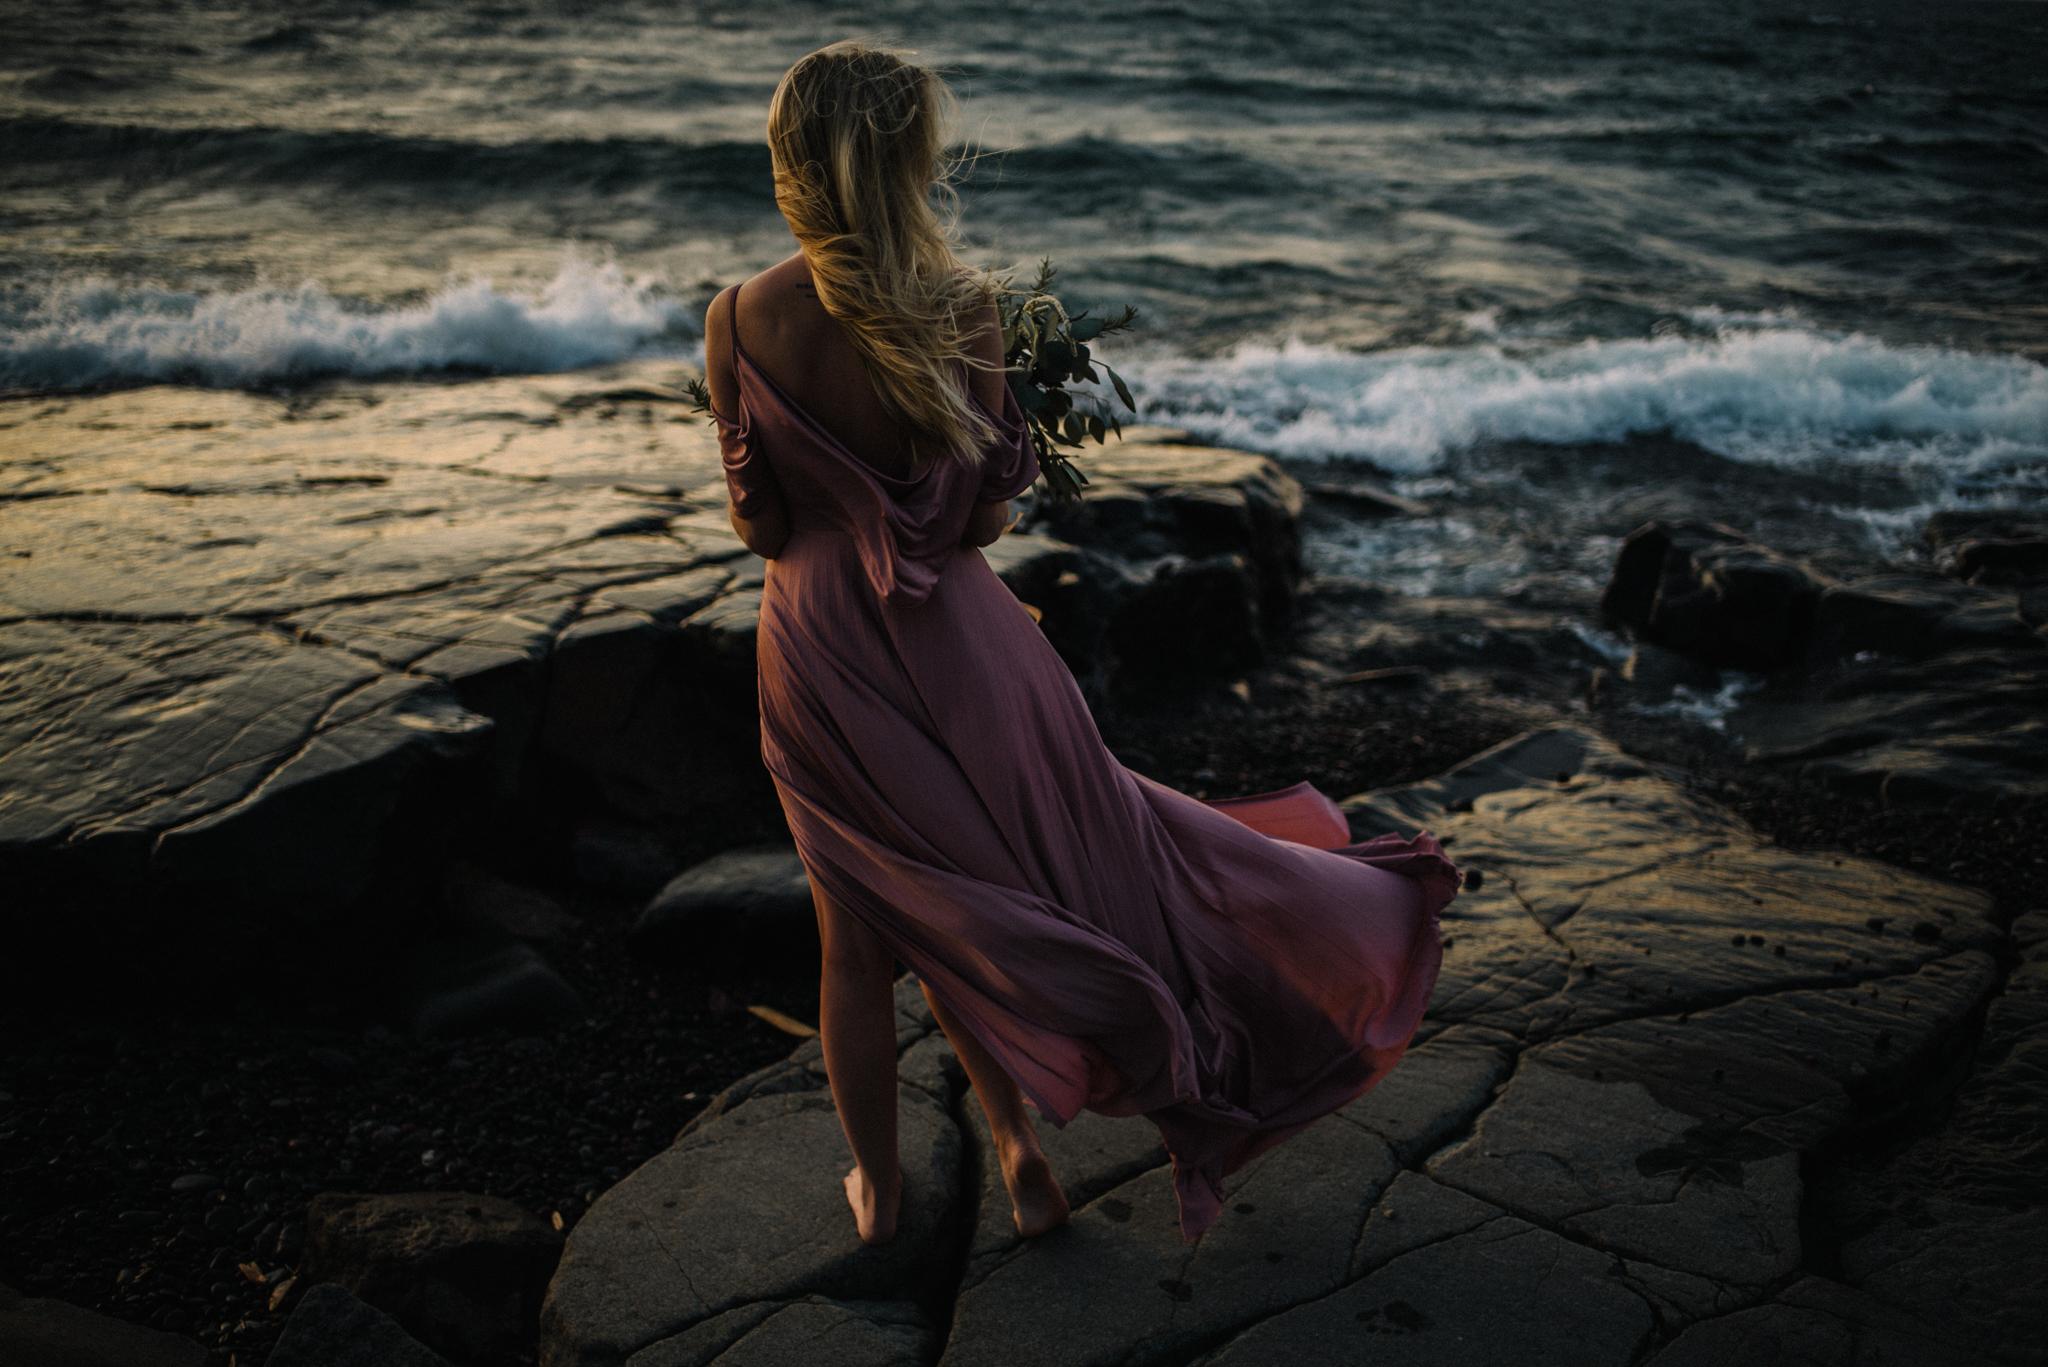 Madeira Creative - Clare Kolars - Emilee Bridal Portraits - White Sails Photography - North Shore - Lake Superior_15.JPG